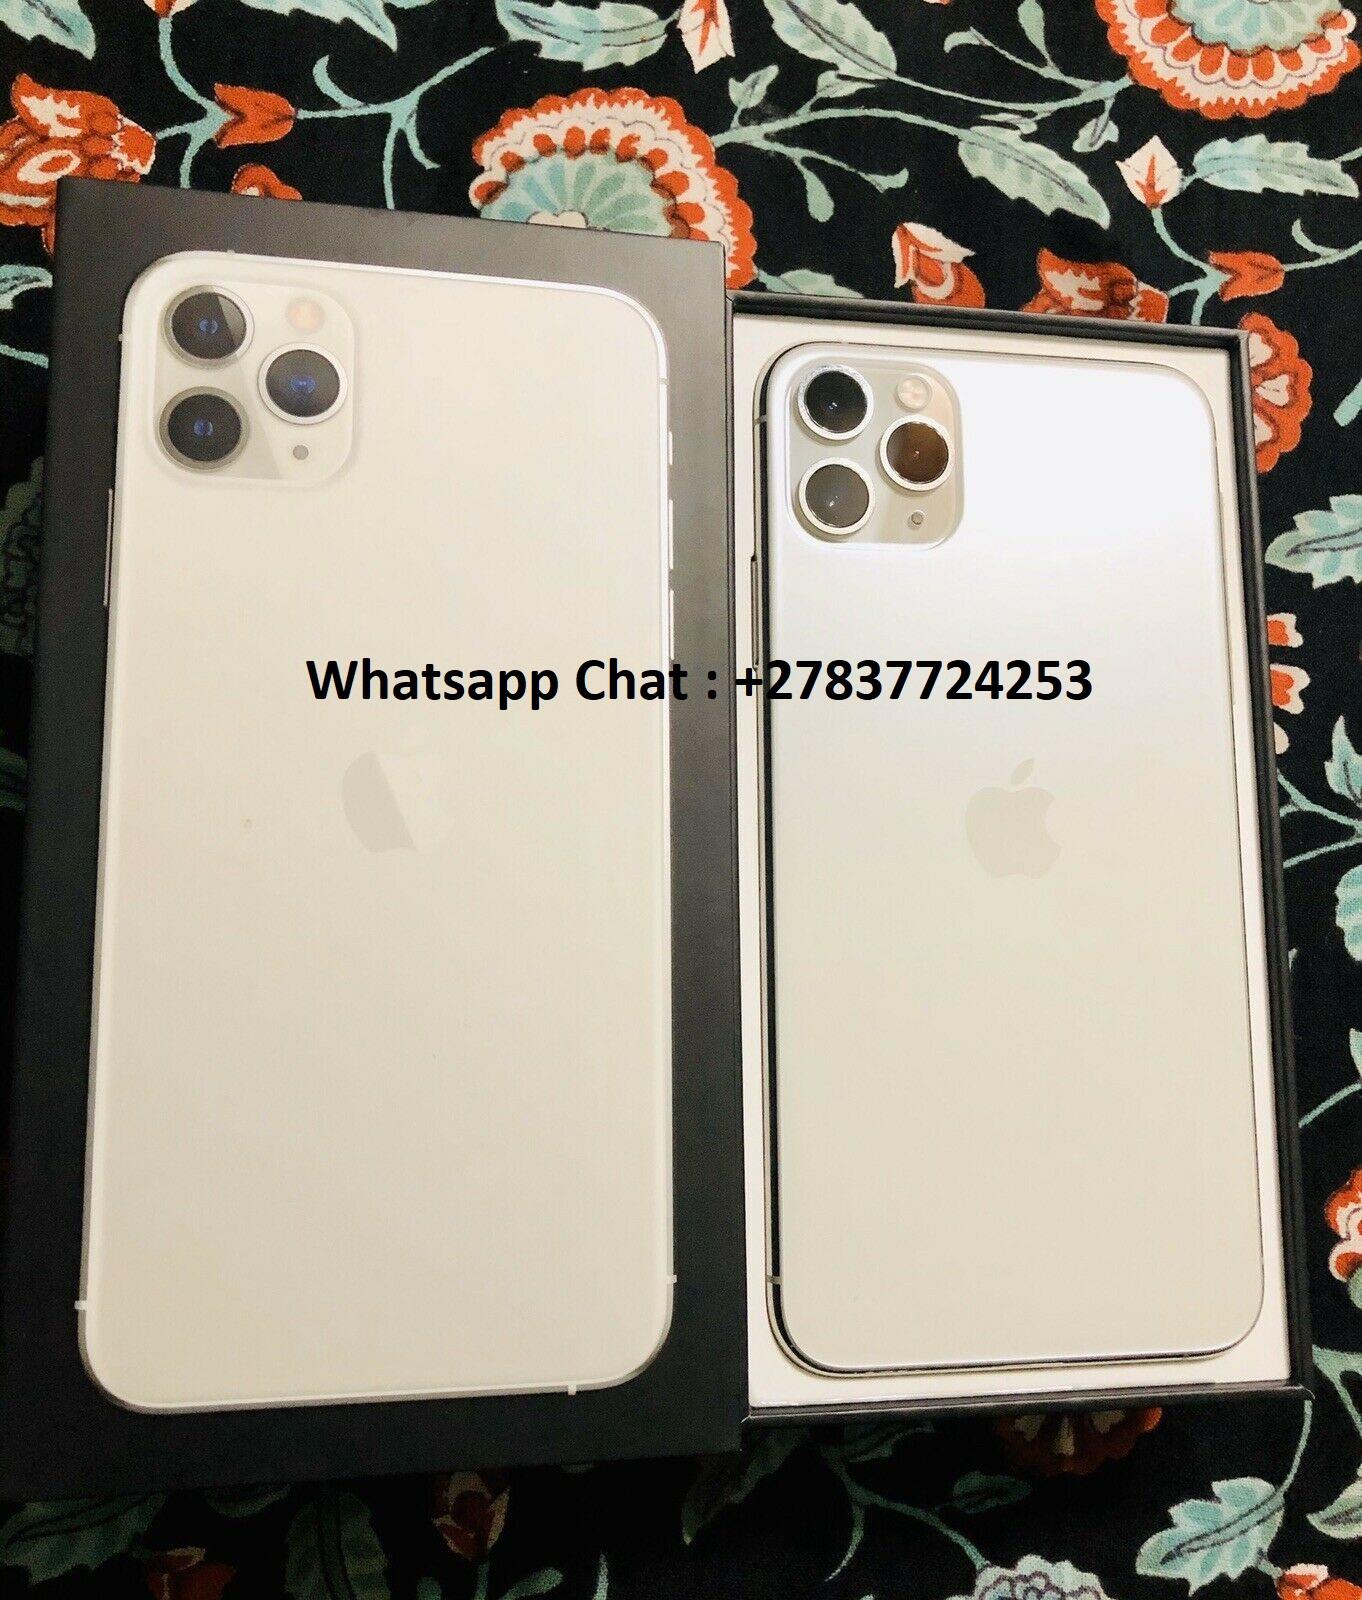 Apple iPhone 11 pro, Apple iPhone 11 pro Max , Apple iPhone XS, Apple iPhone XS Max, Apple iPhone XR, Apple iPhone X, Apple iphone 8, iPhone 8 Plus